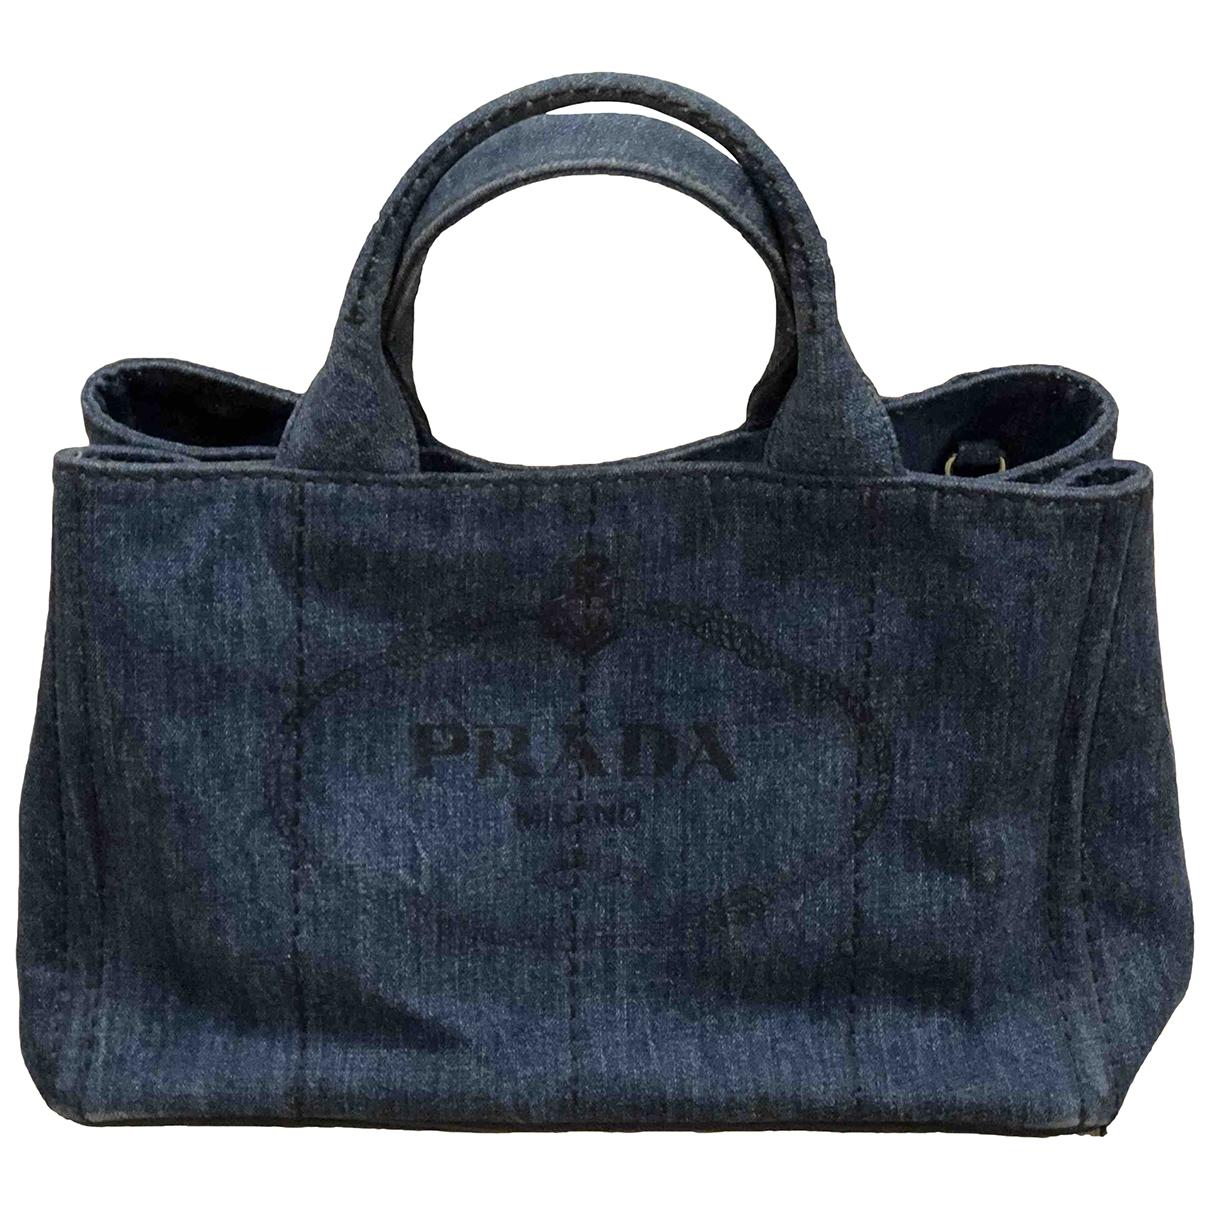 Prada \N Blue Denim - Jeans handbag for Women \N